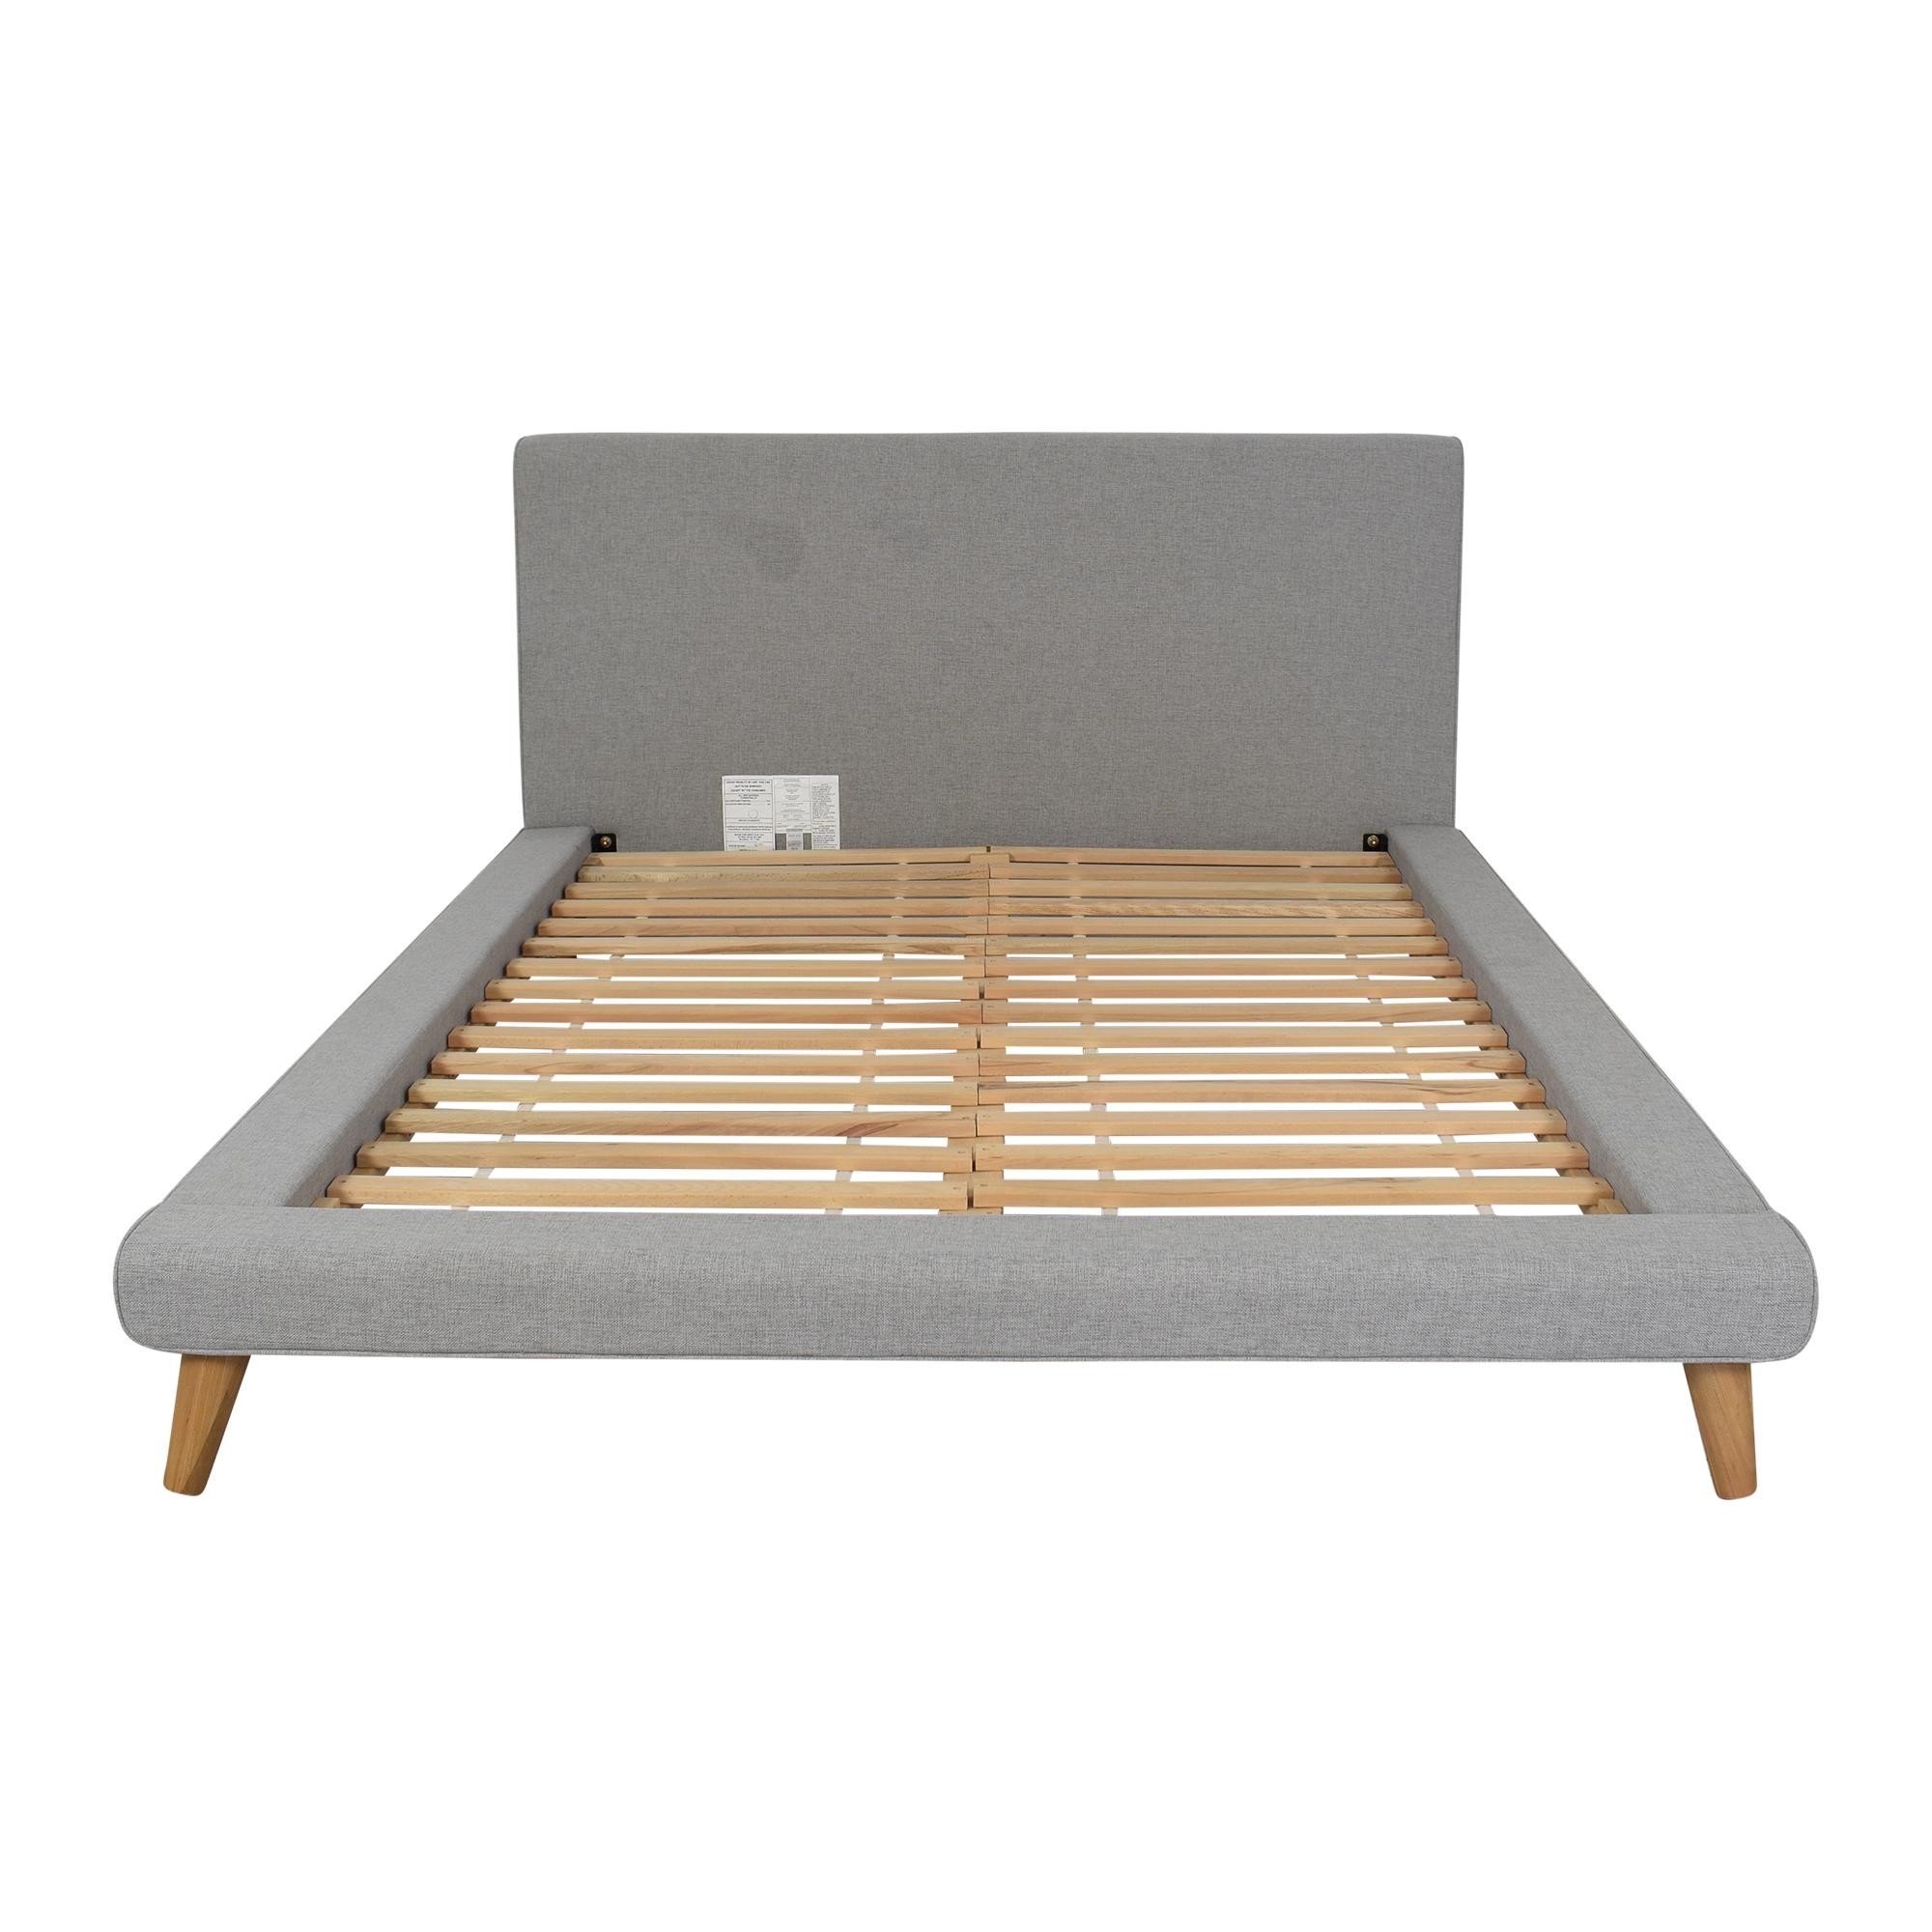 West Elm West Elm Mod Upholstered Queen Bed second hand